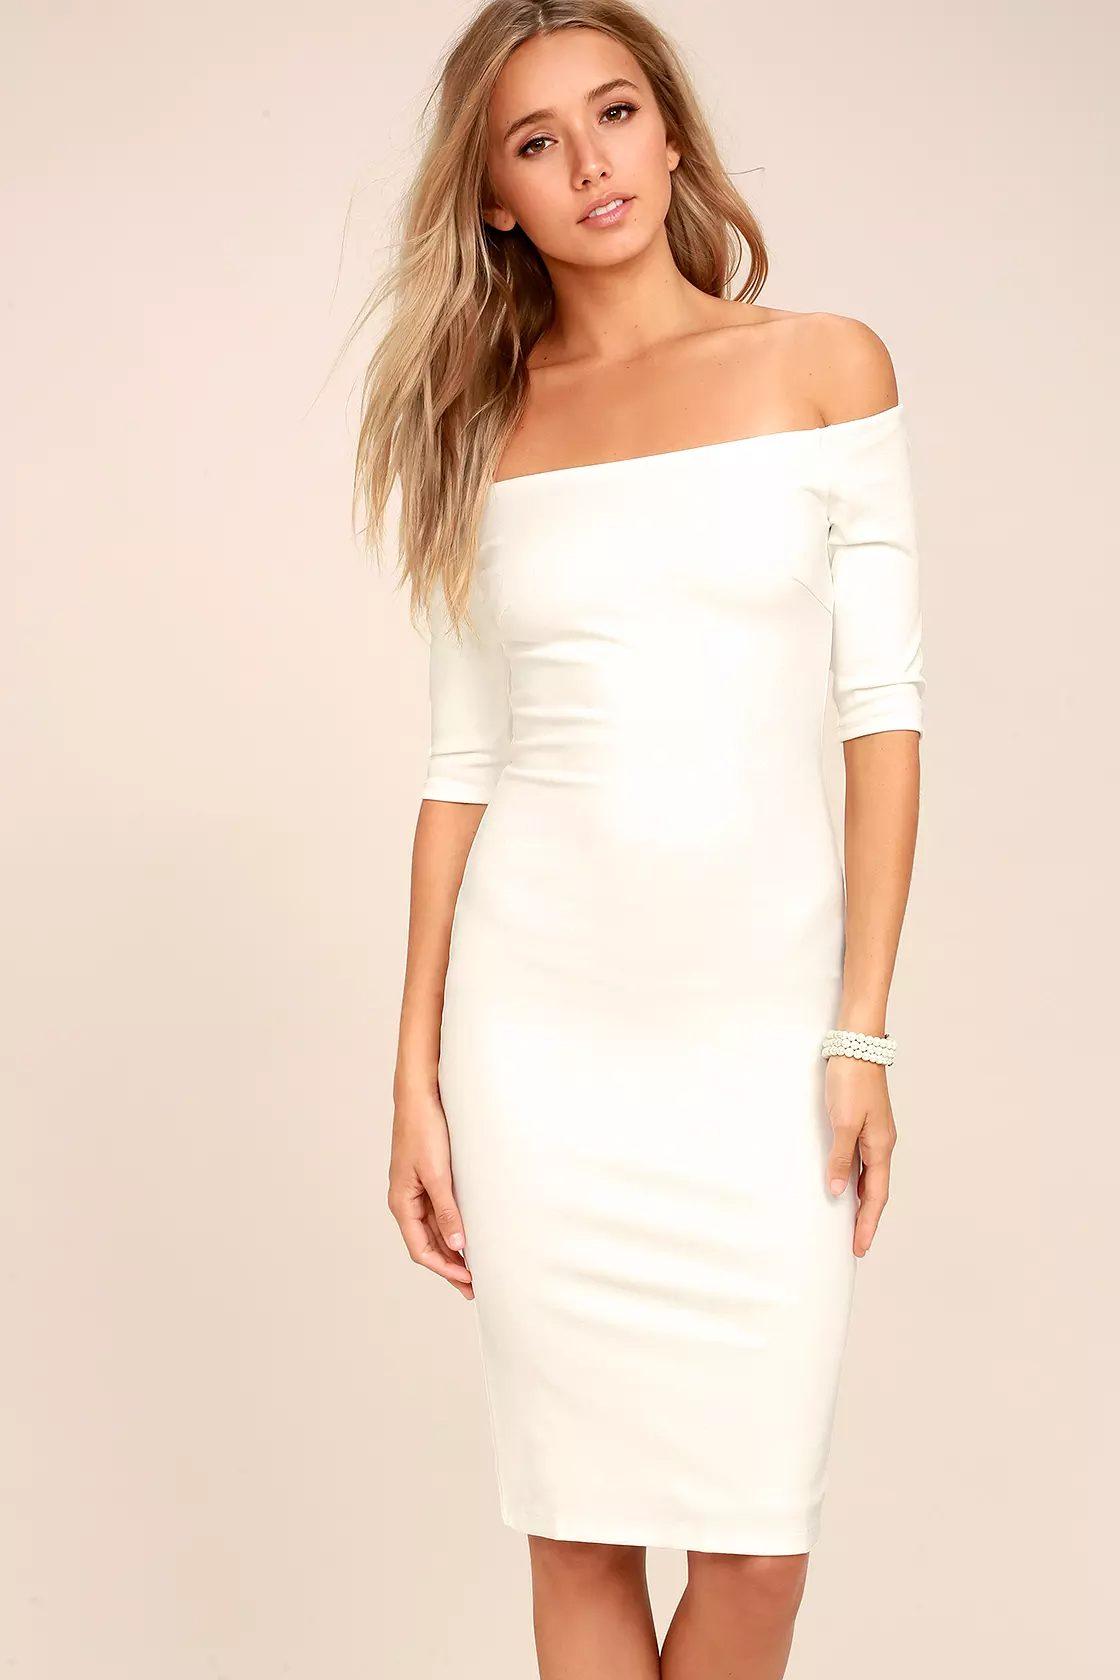 White bodycon dress for graduation